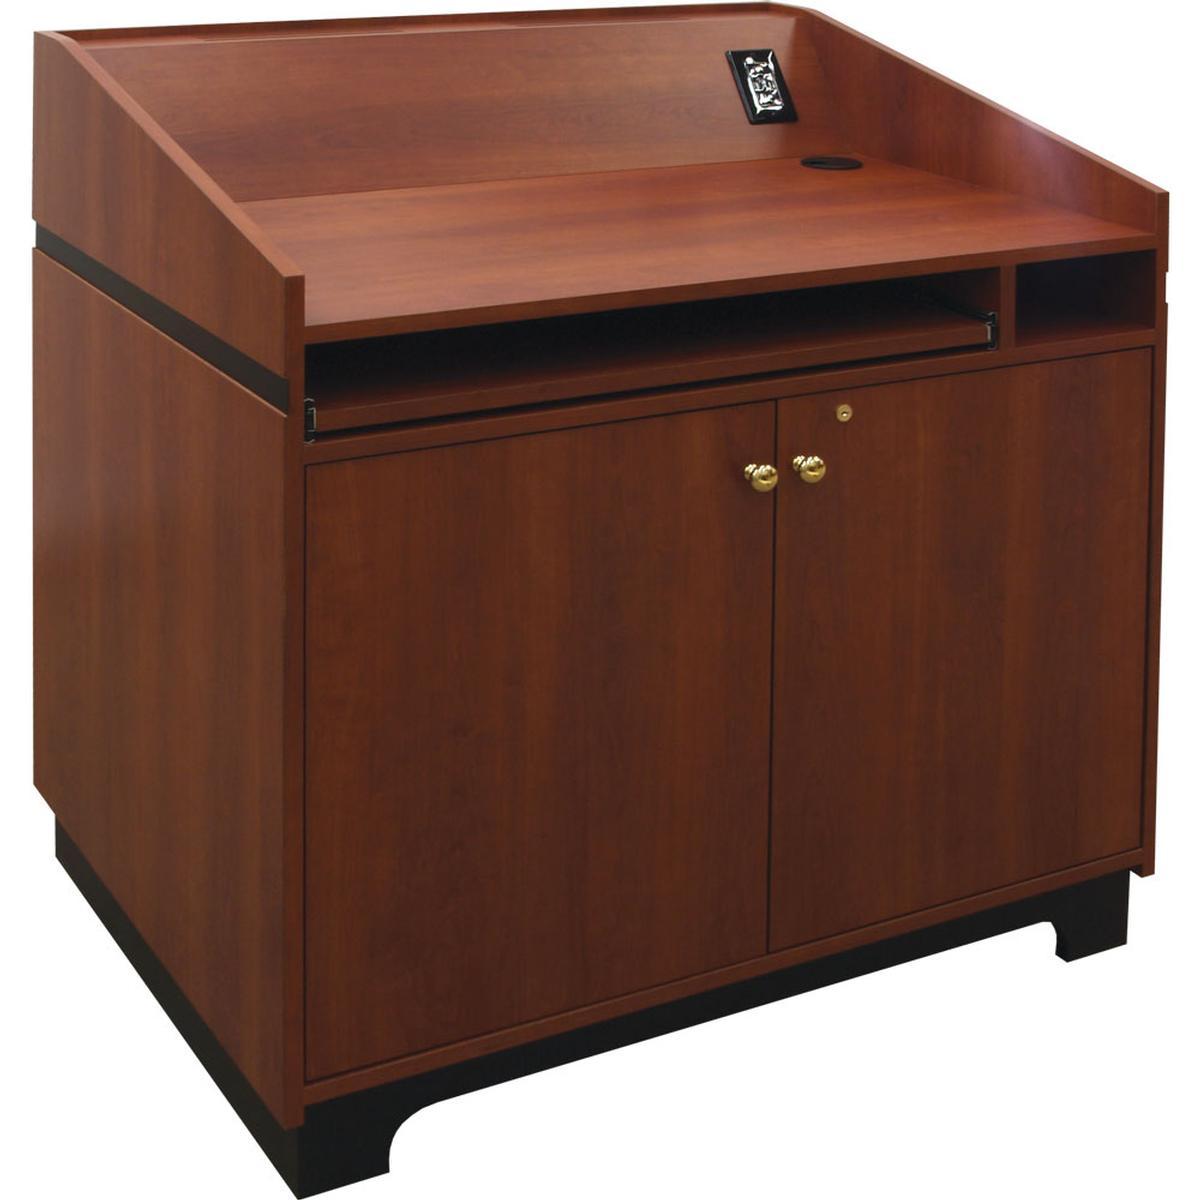 Mlcs 40 Marshall Furniture Custom Classic Style Lectern